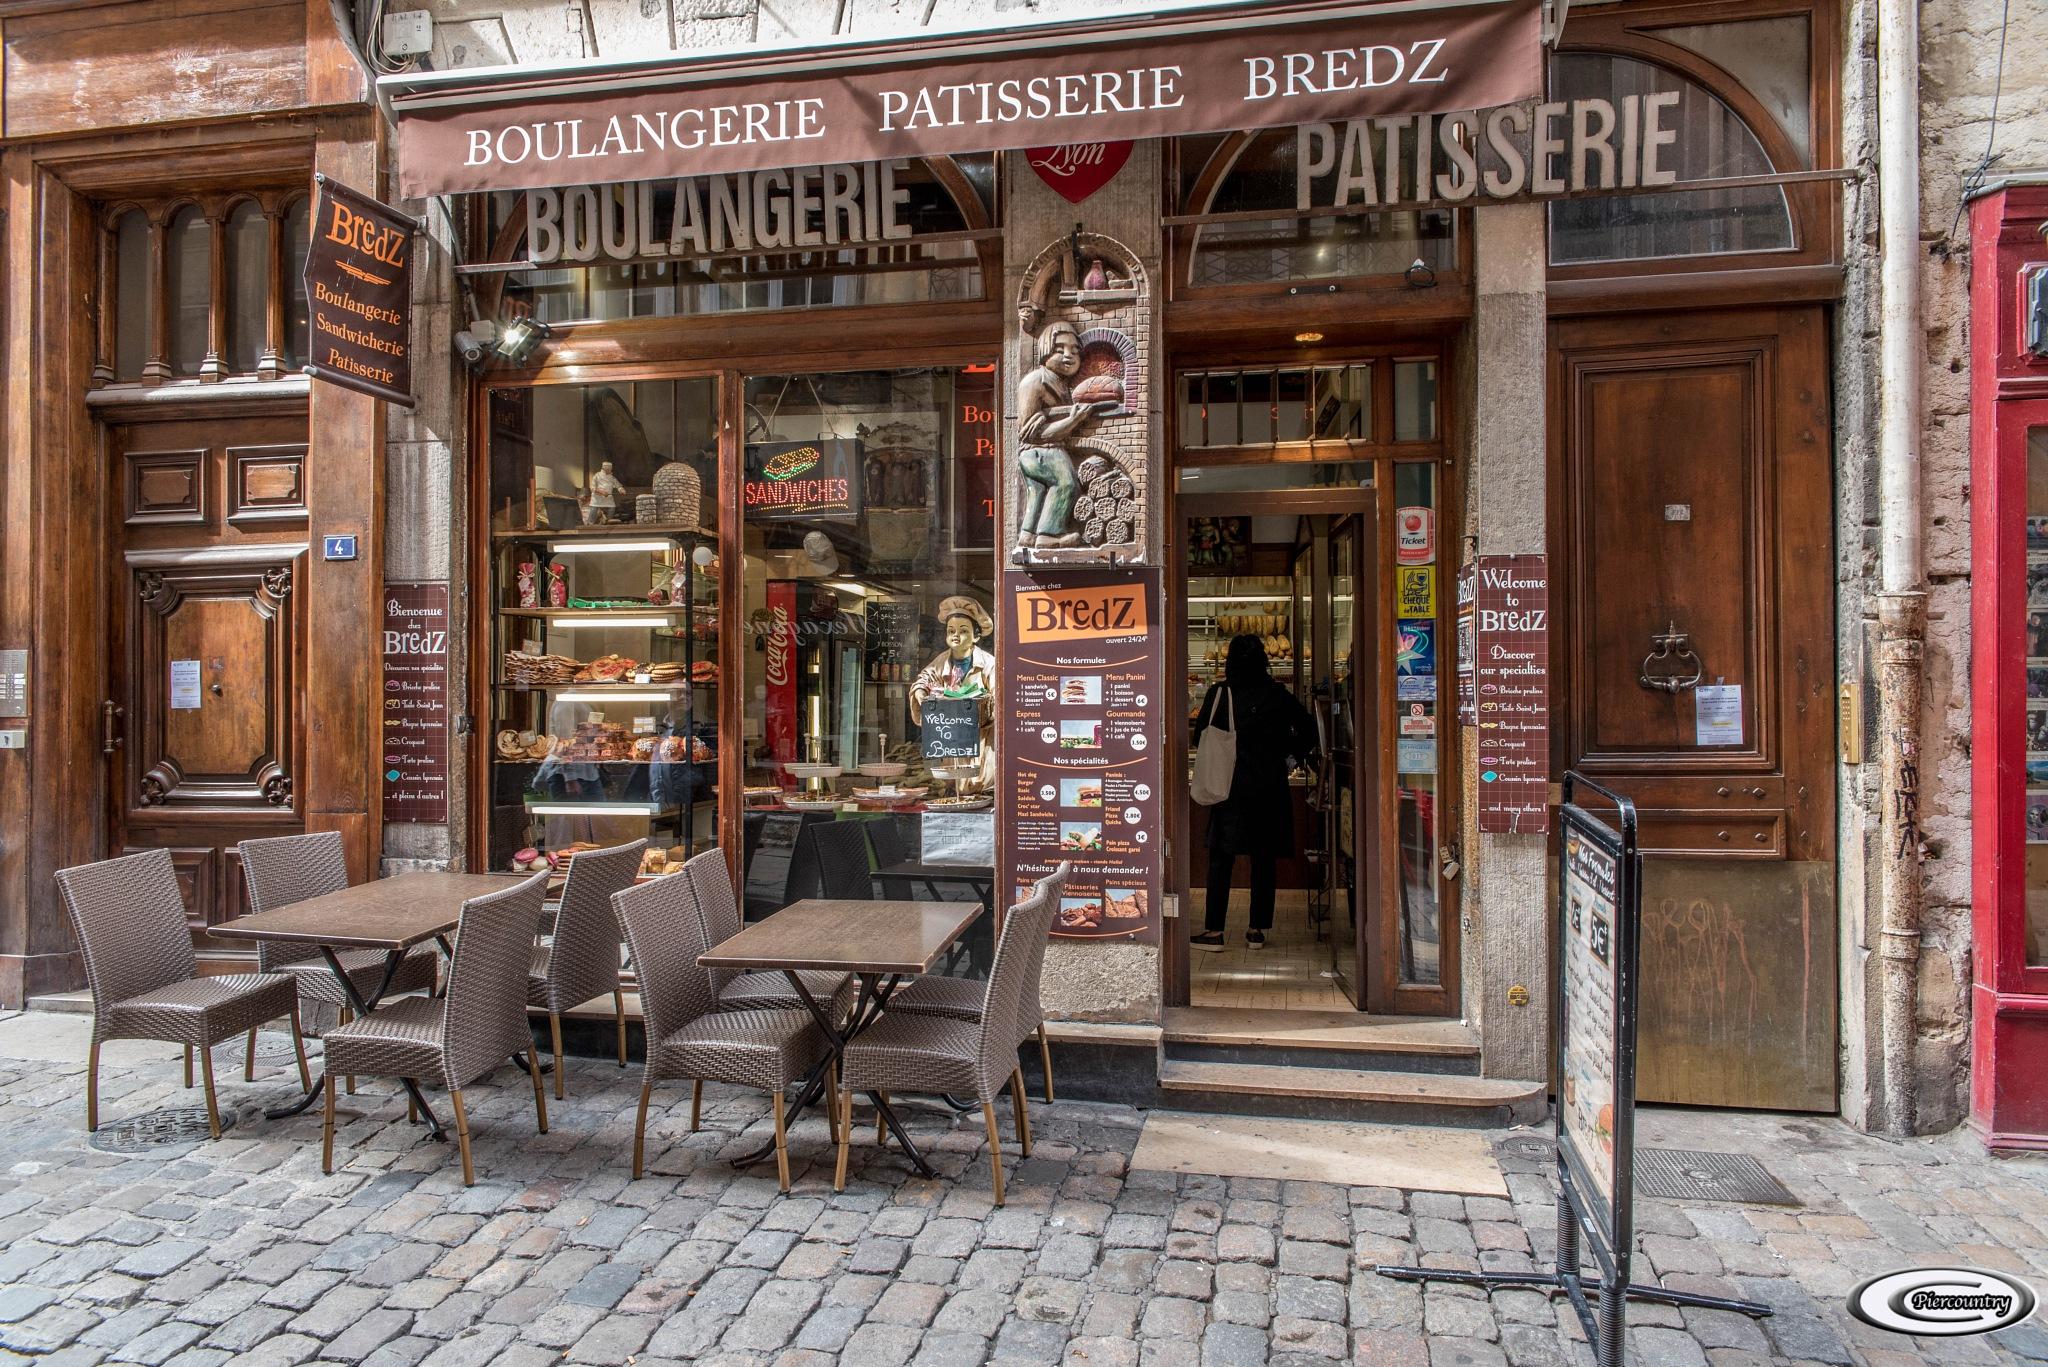 Au hasard des rue à Lyon by Piercountry